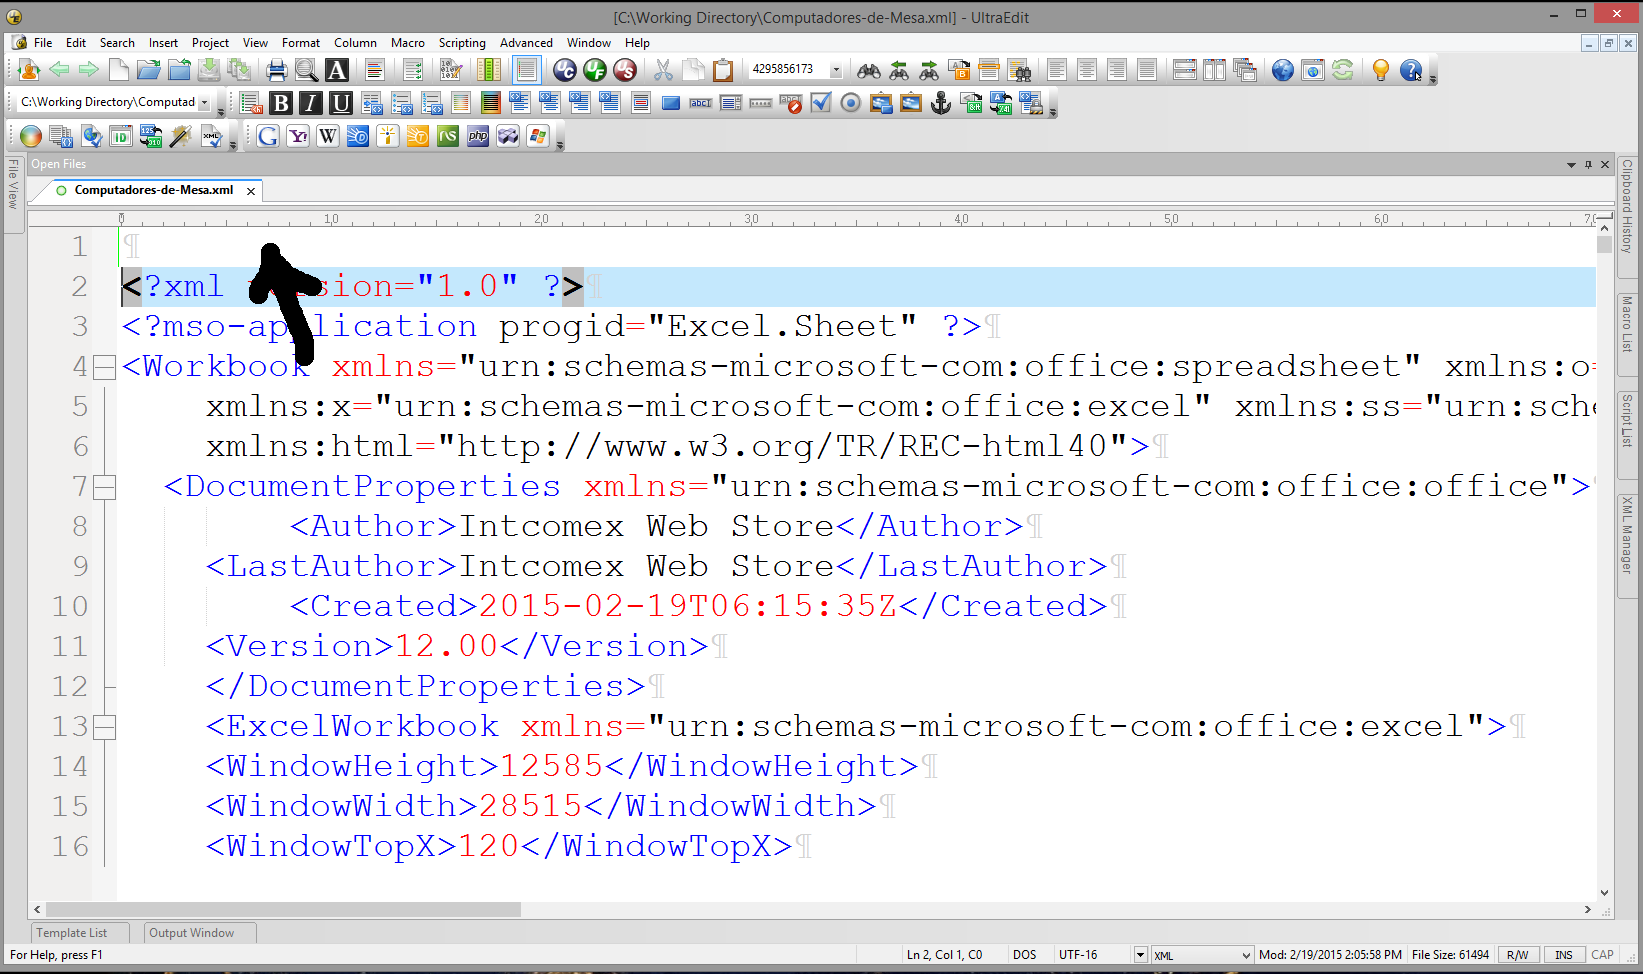 Workbooks workbook xmlns : VS2013: Windows Form: Load Excel xml into form with textboxes.